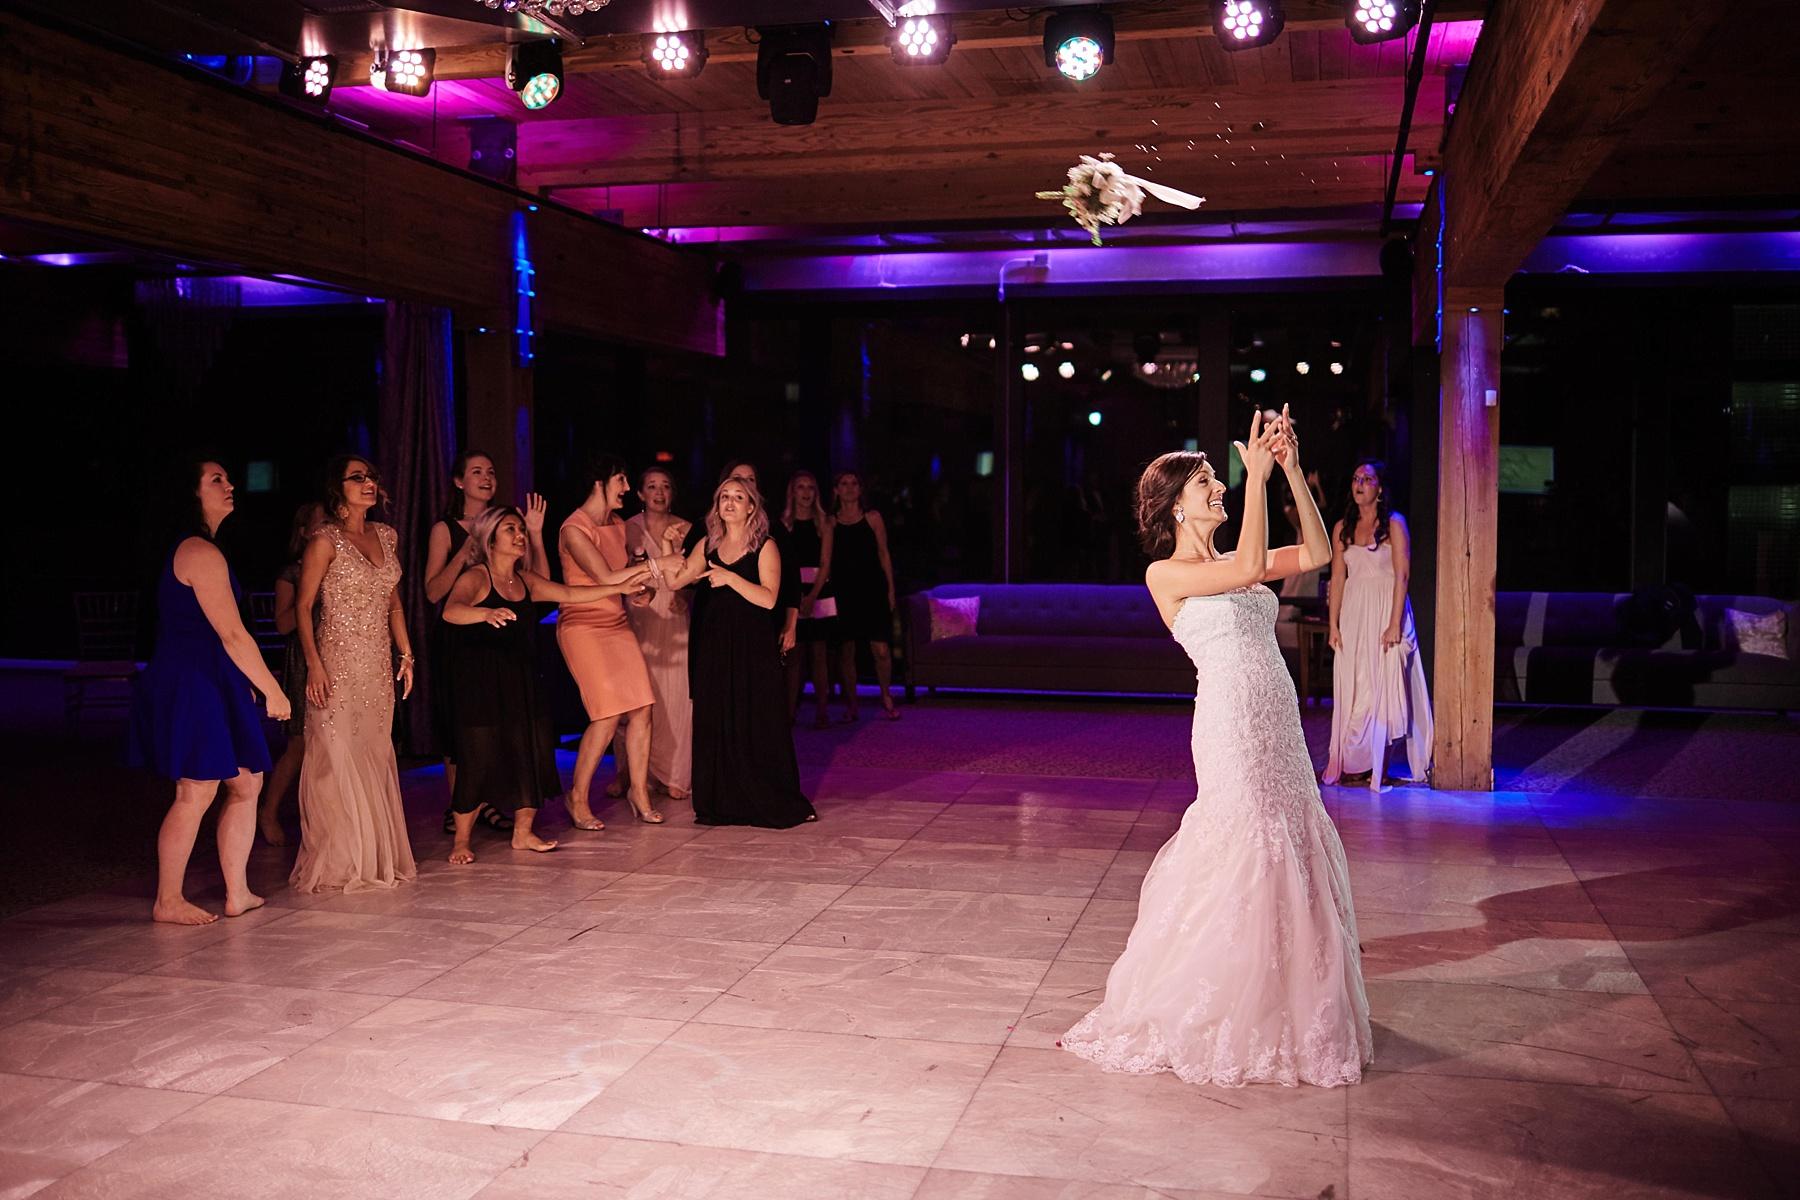 ABULAE-Wedding-Saint-paul-MN-Josh-Sofia-Wedding-Mears-Park_0862.jpg